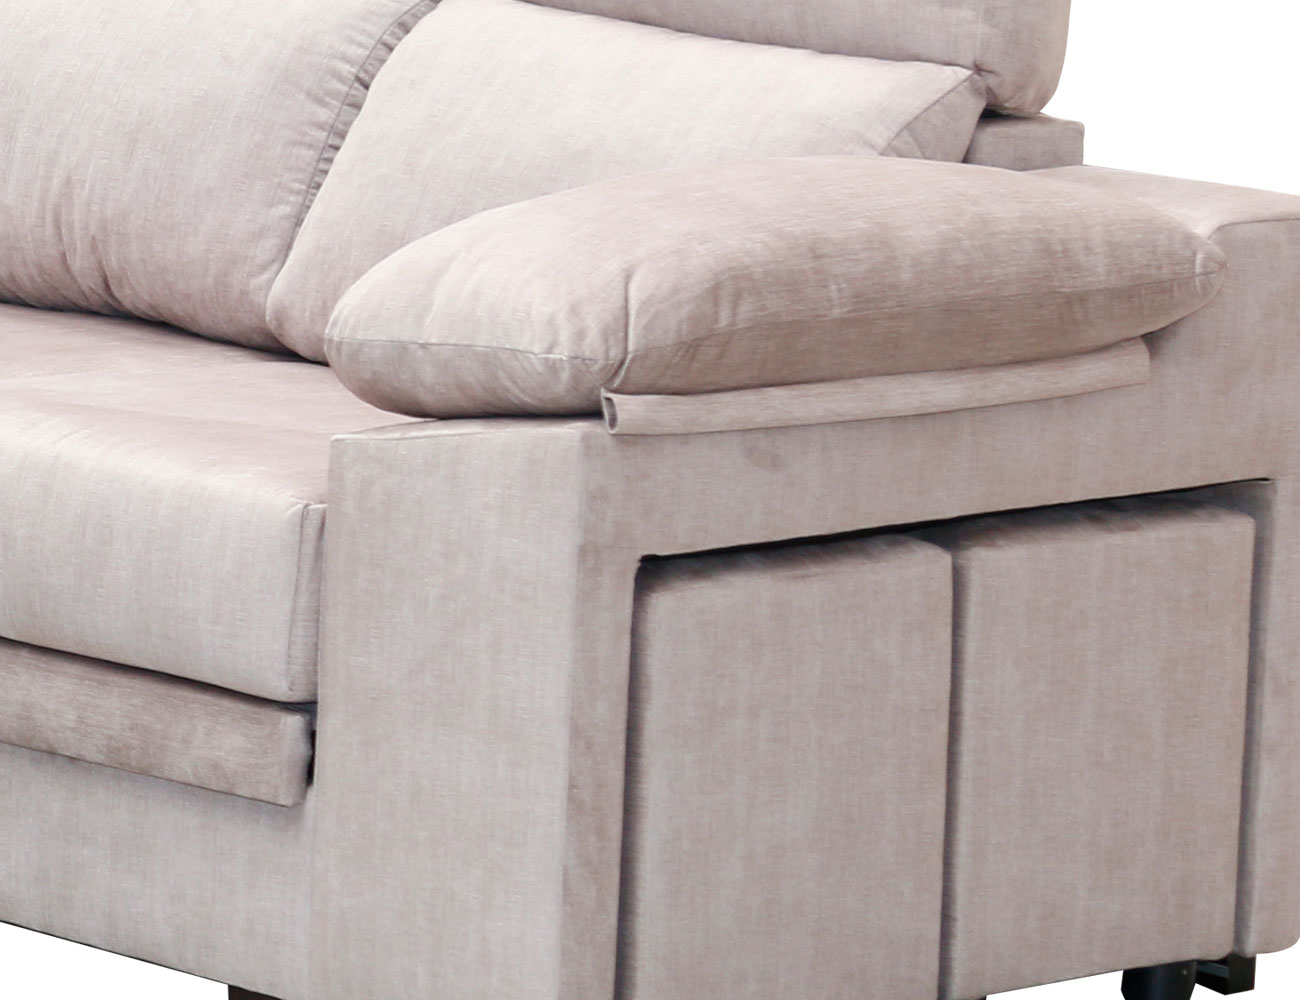 Sofa rincon rinconera beig pufs 4